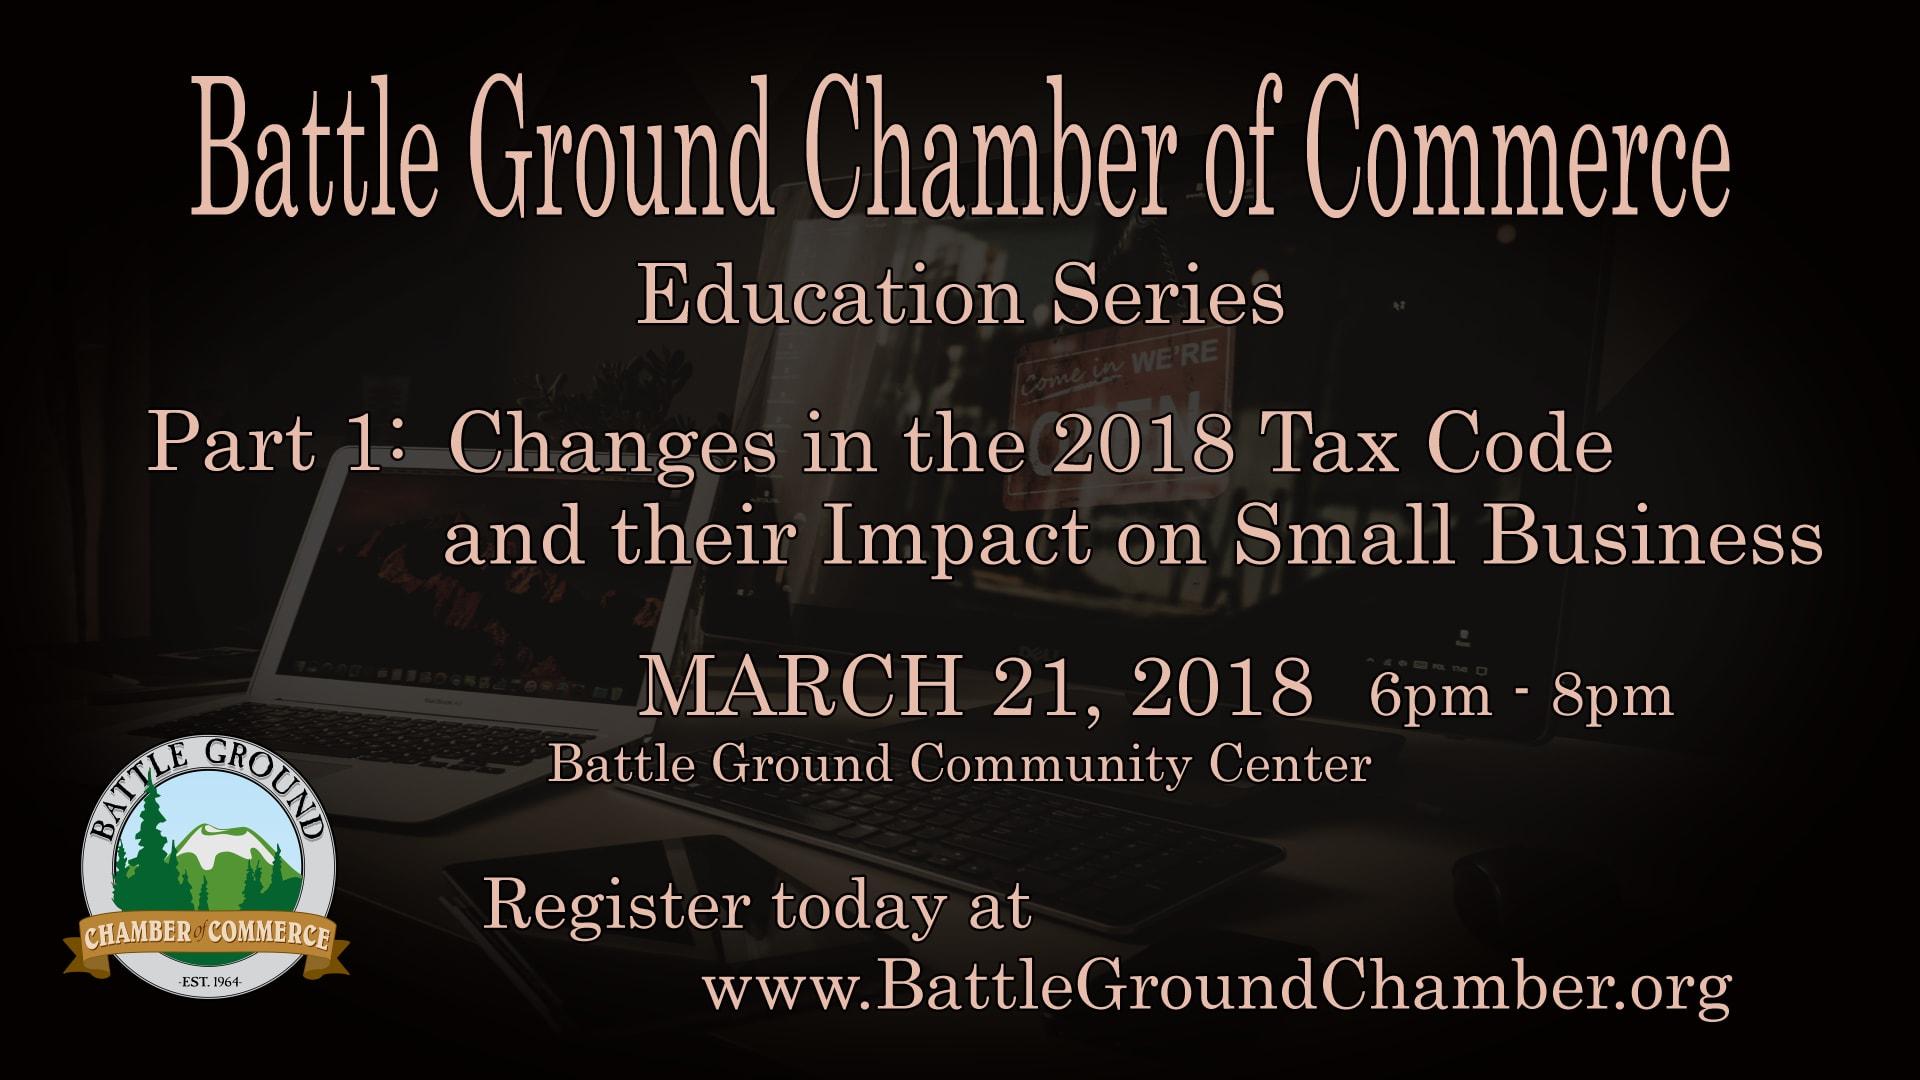 Battle-Ground-Cinema-Slide---Chamber-Education-Series---Part-1.b-w1920.jpg